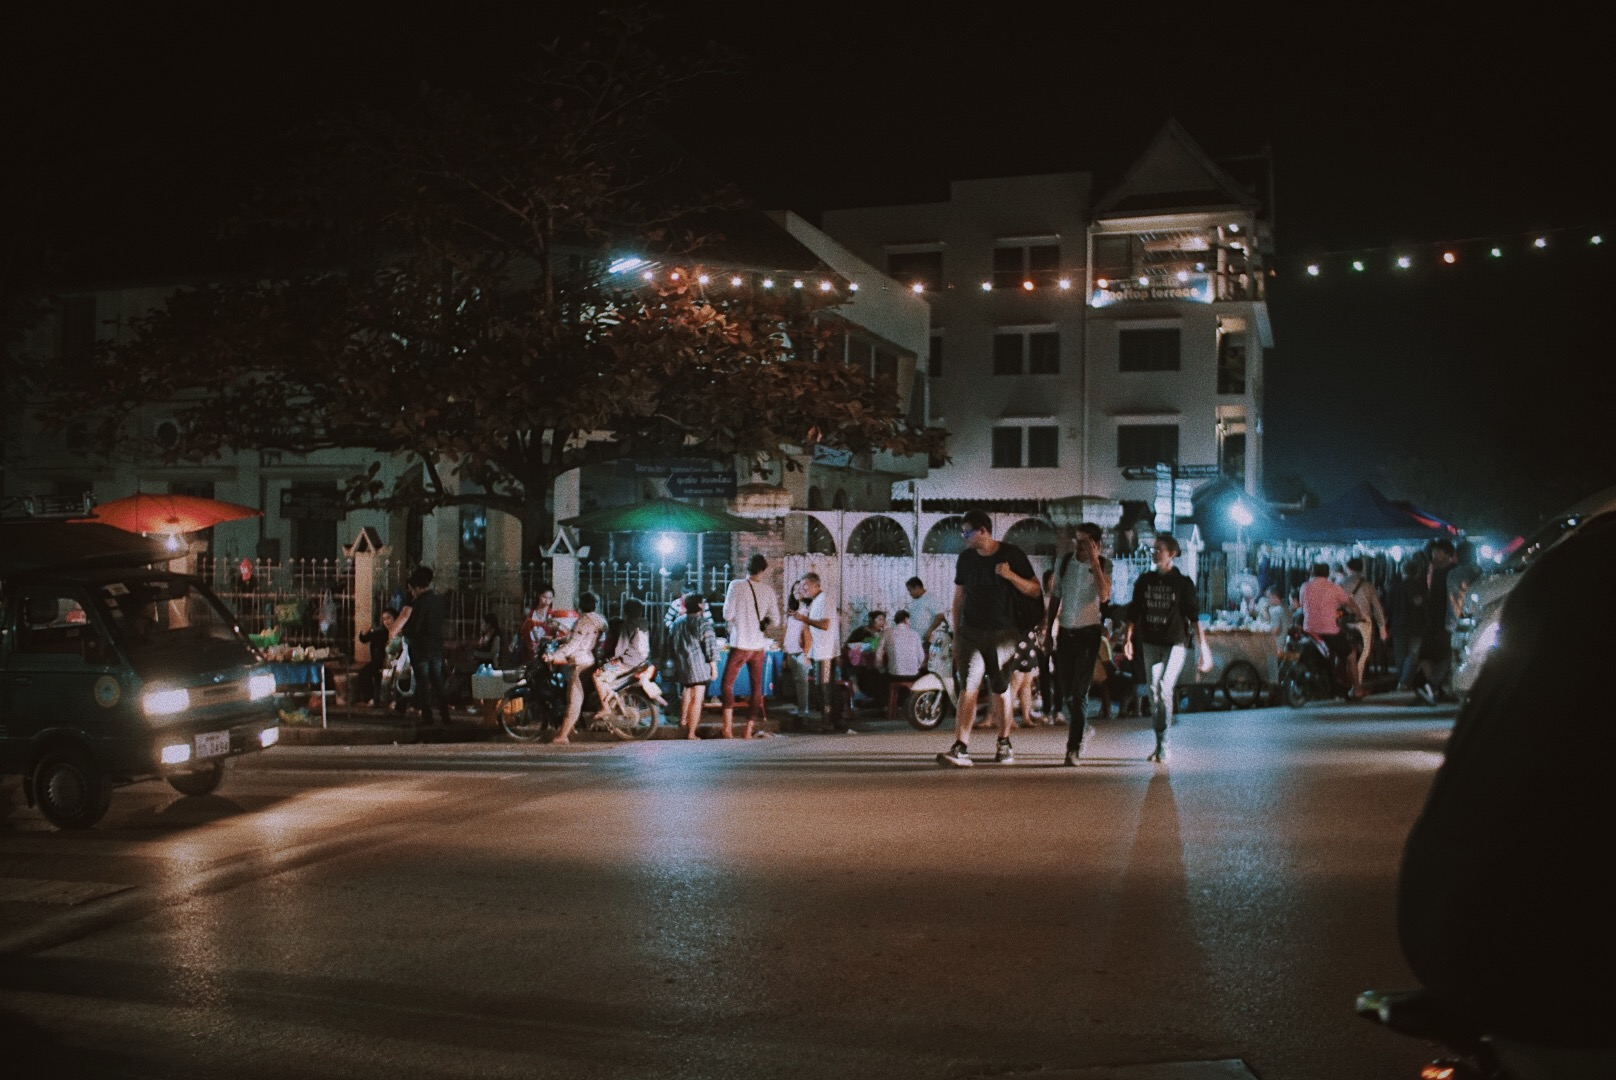 Kalau ini, jalanan menuju Night Market, tempat hunting kain dan souvenir lucu-lucu. Detailnya di next post ya!